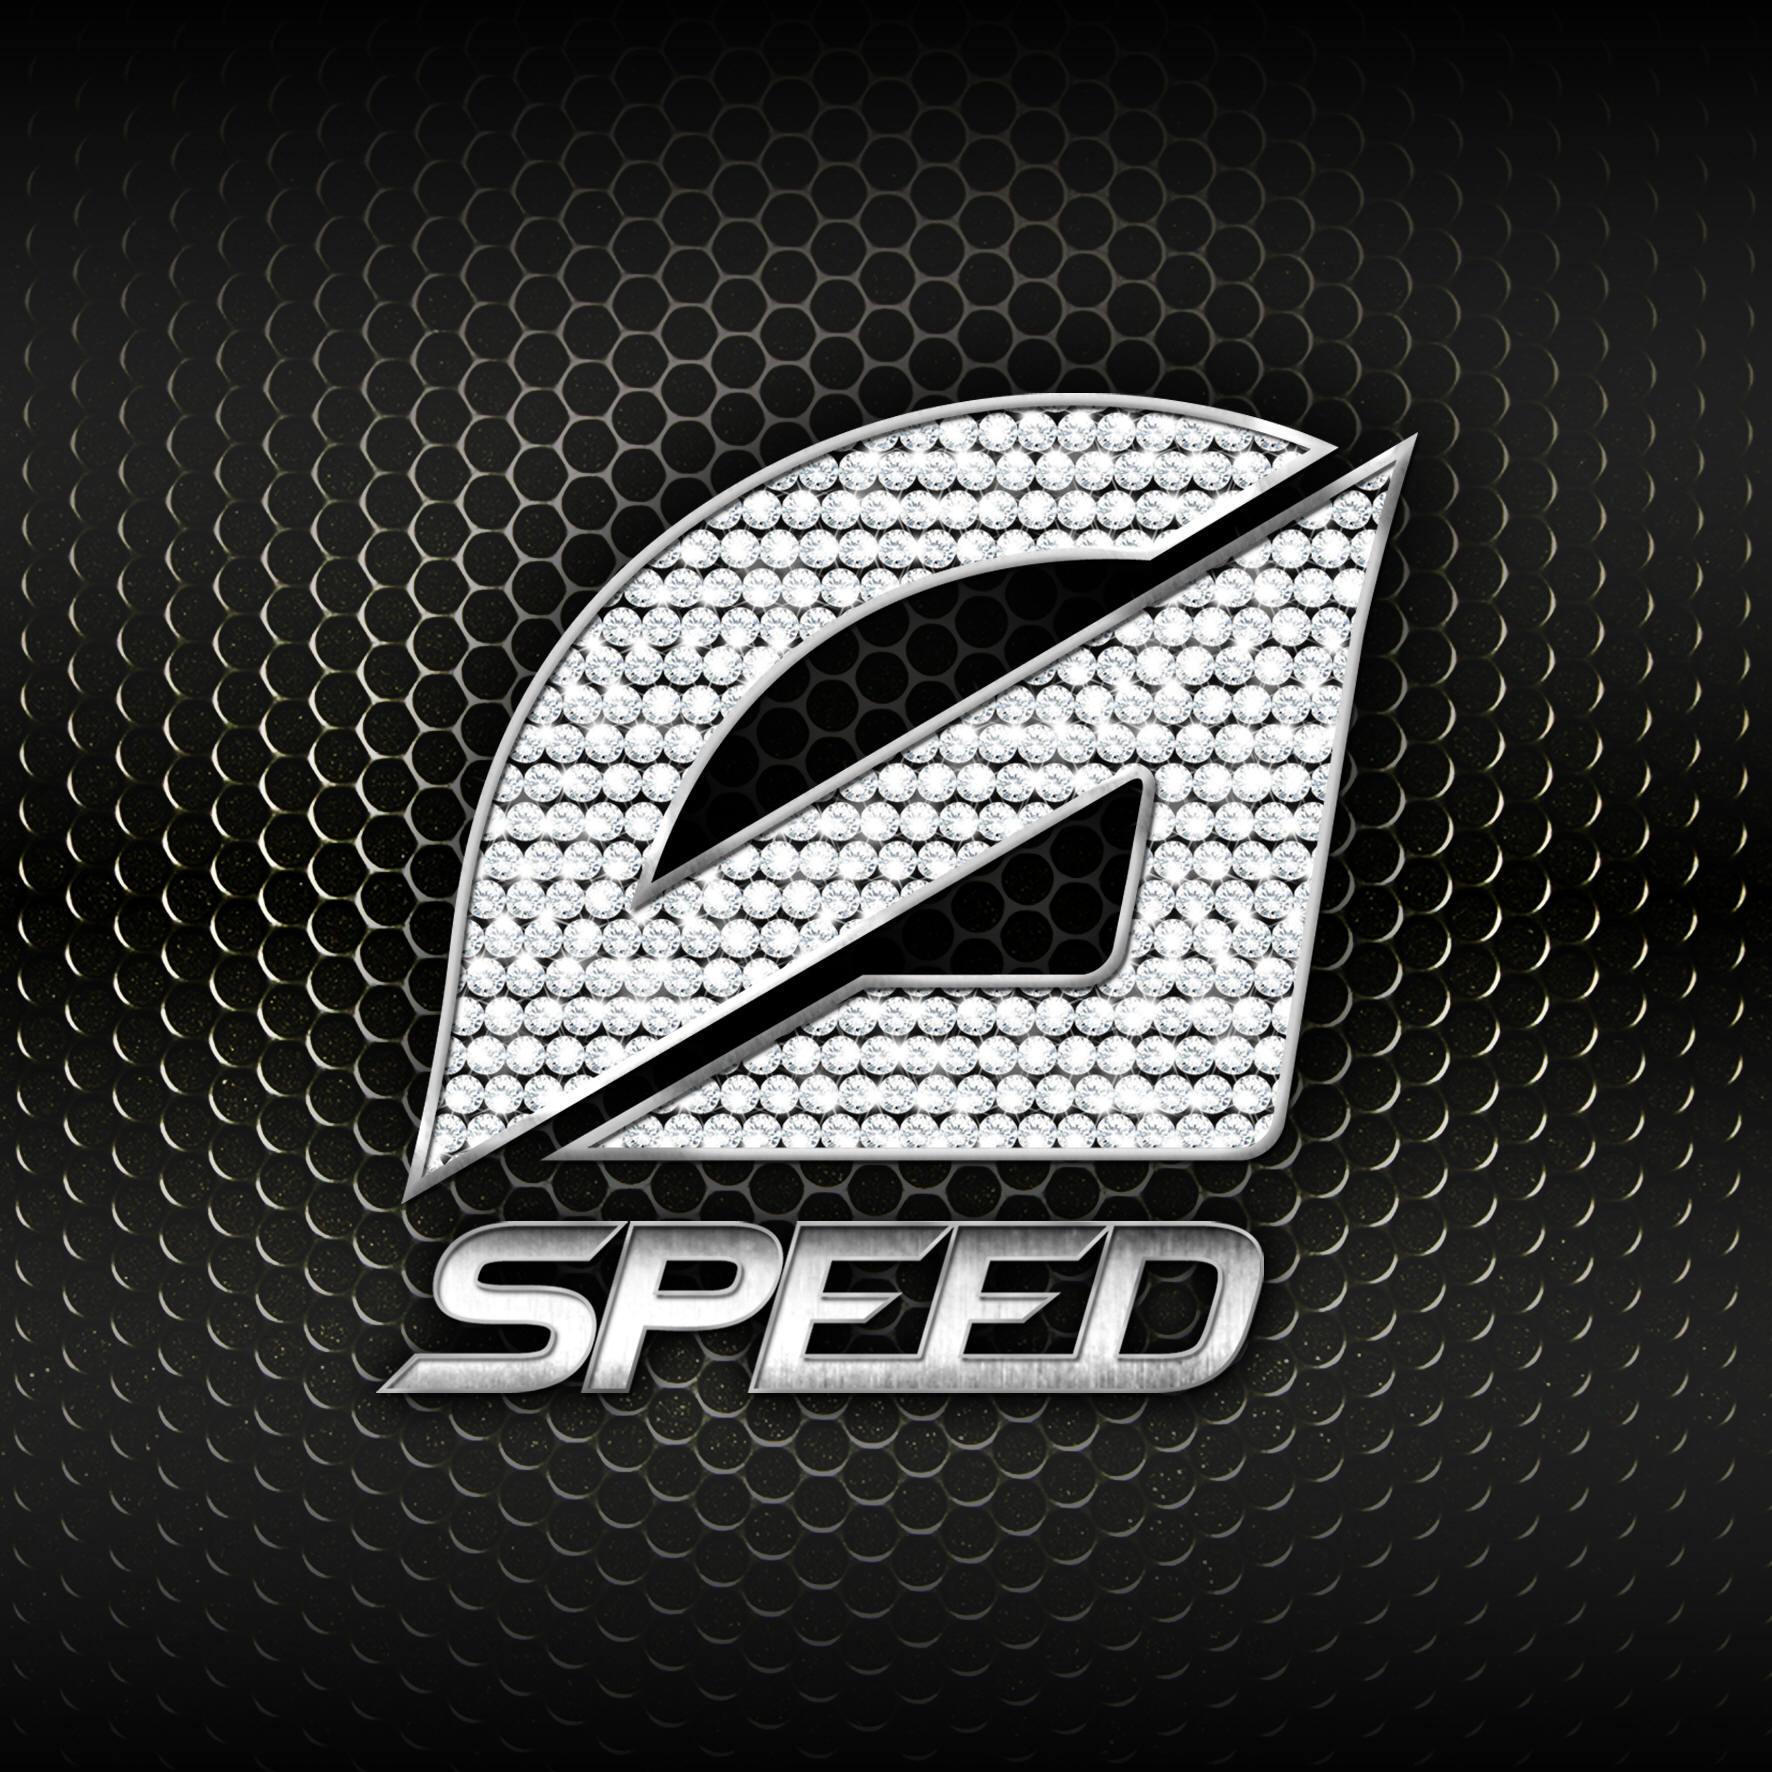 SINGLE] SPEED - Speed Of Light ~ Blessing Blog